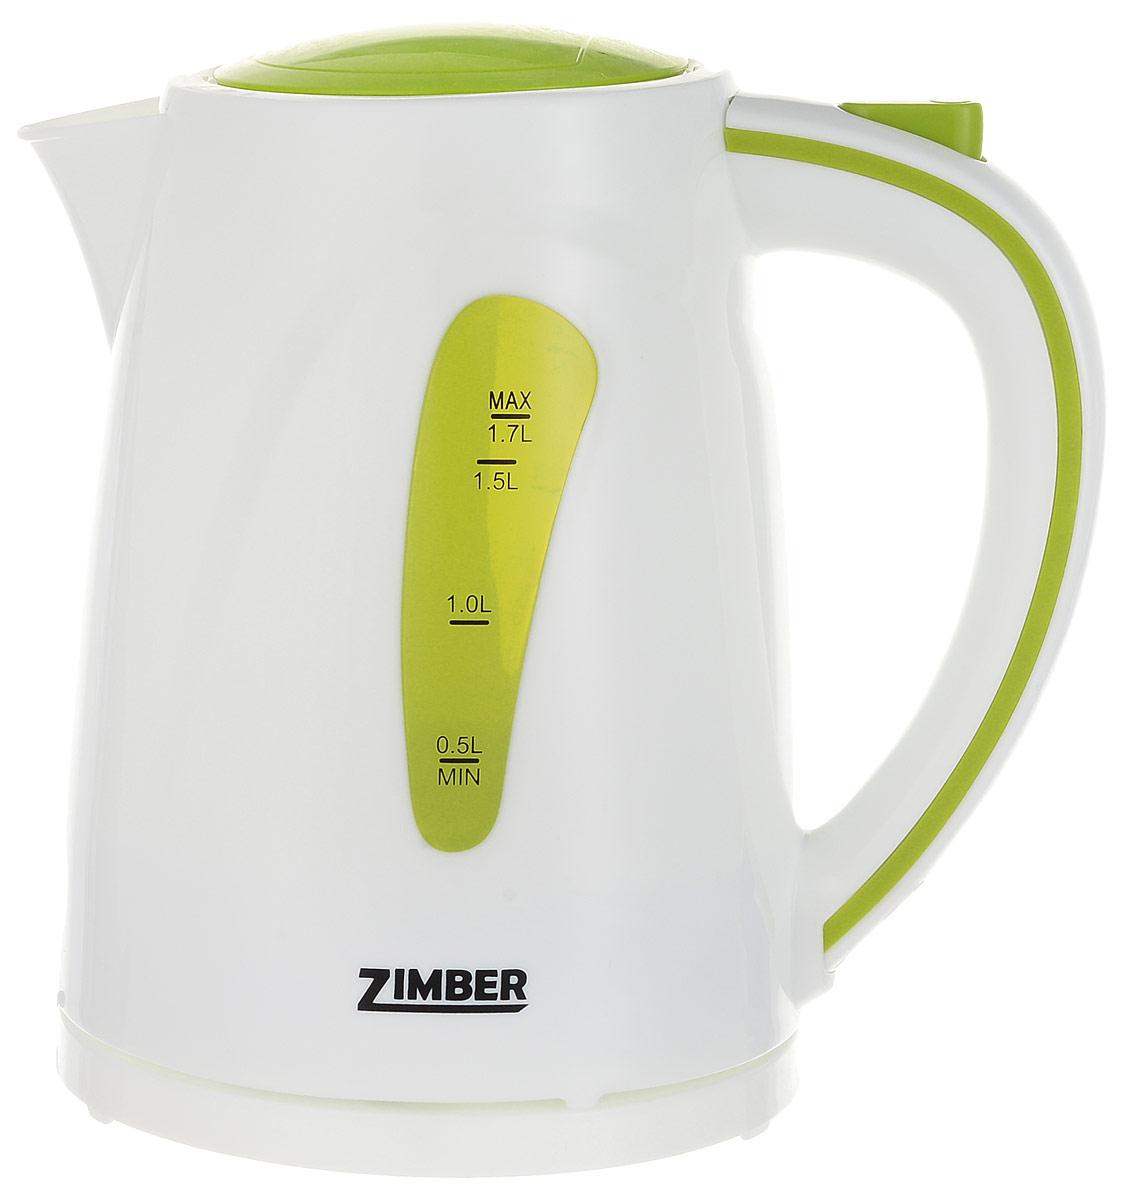 Zimber ZM-10838 электрический чайник цена и фото